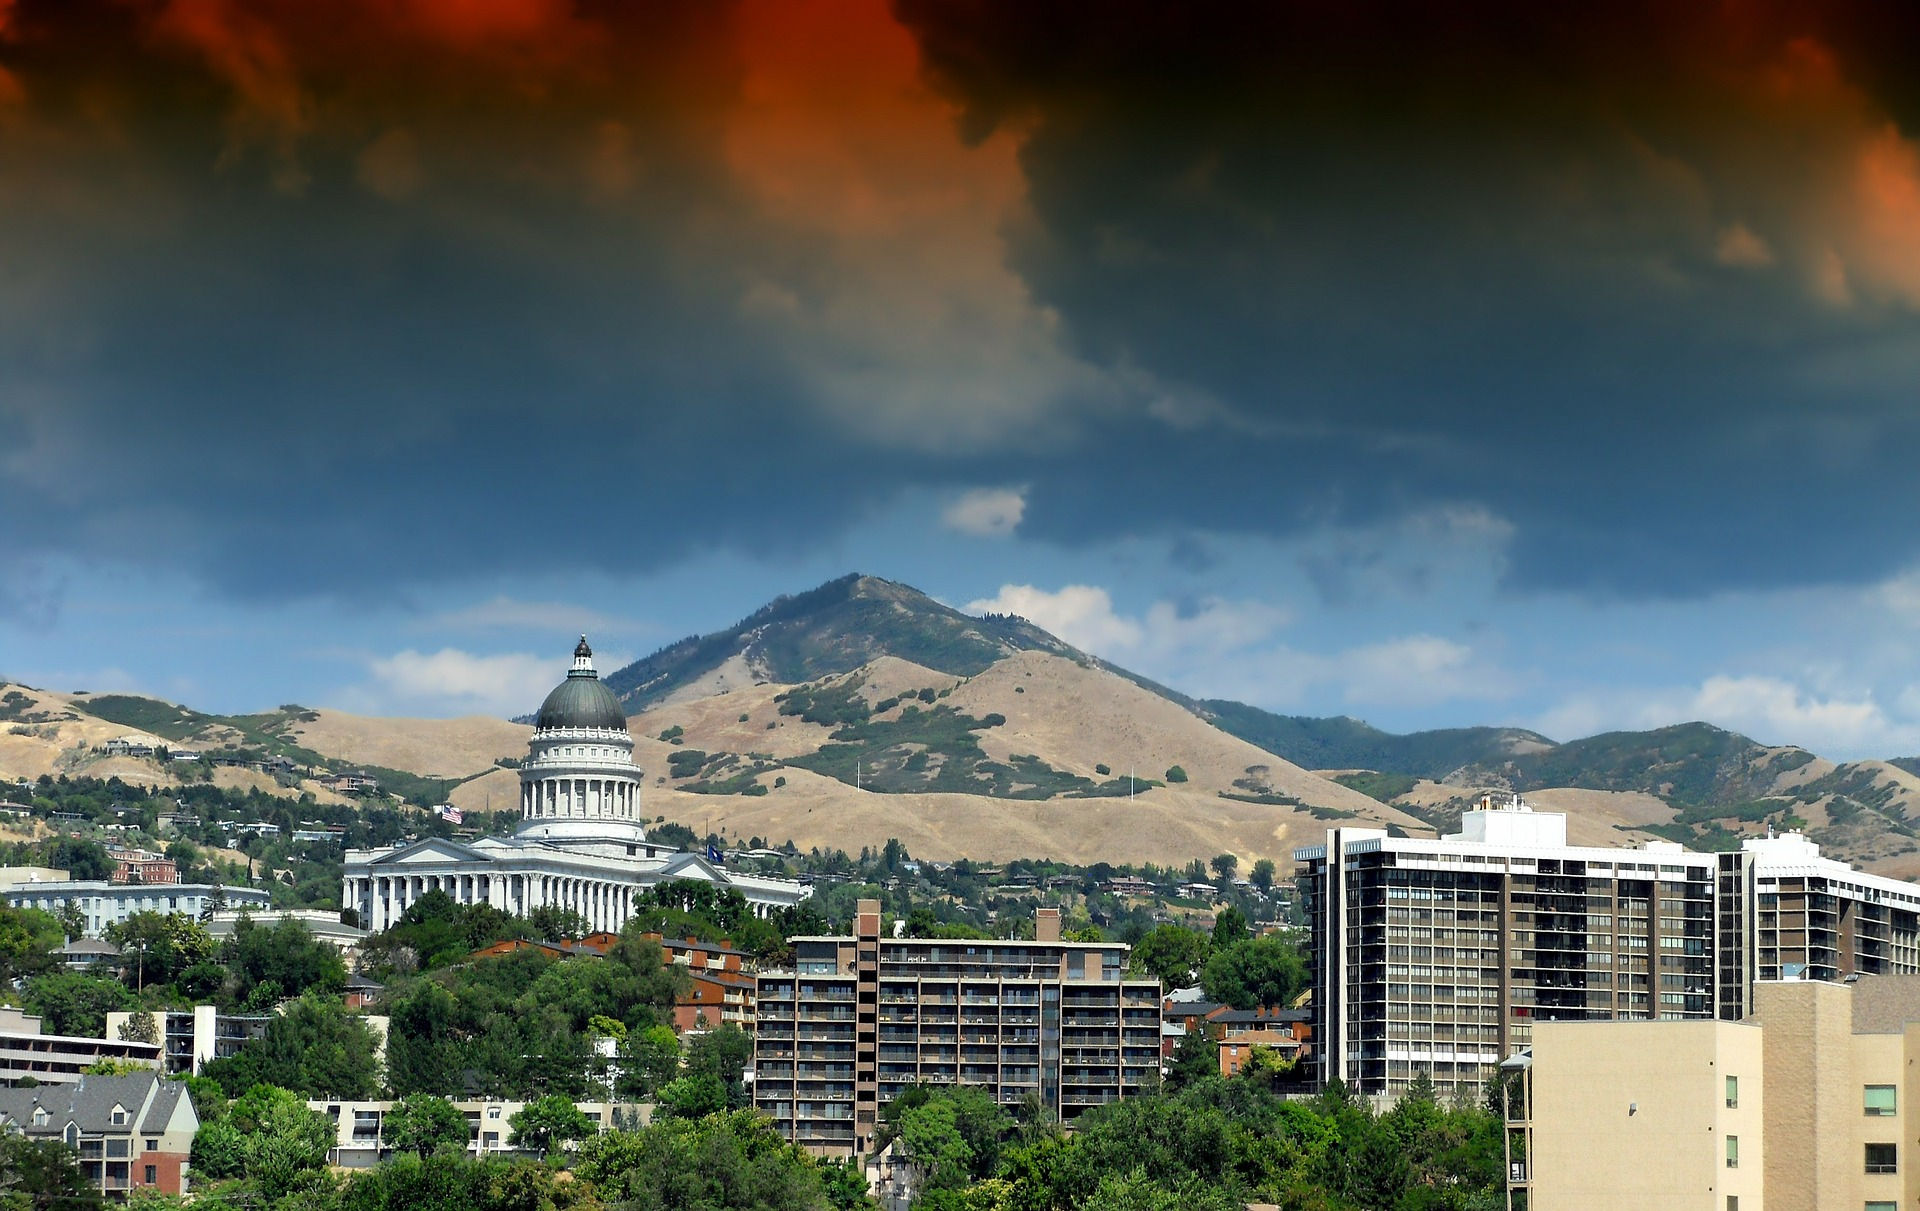 Utah slot machine casino gambling ... does not exist.